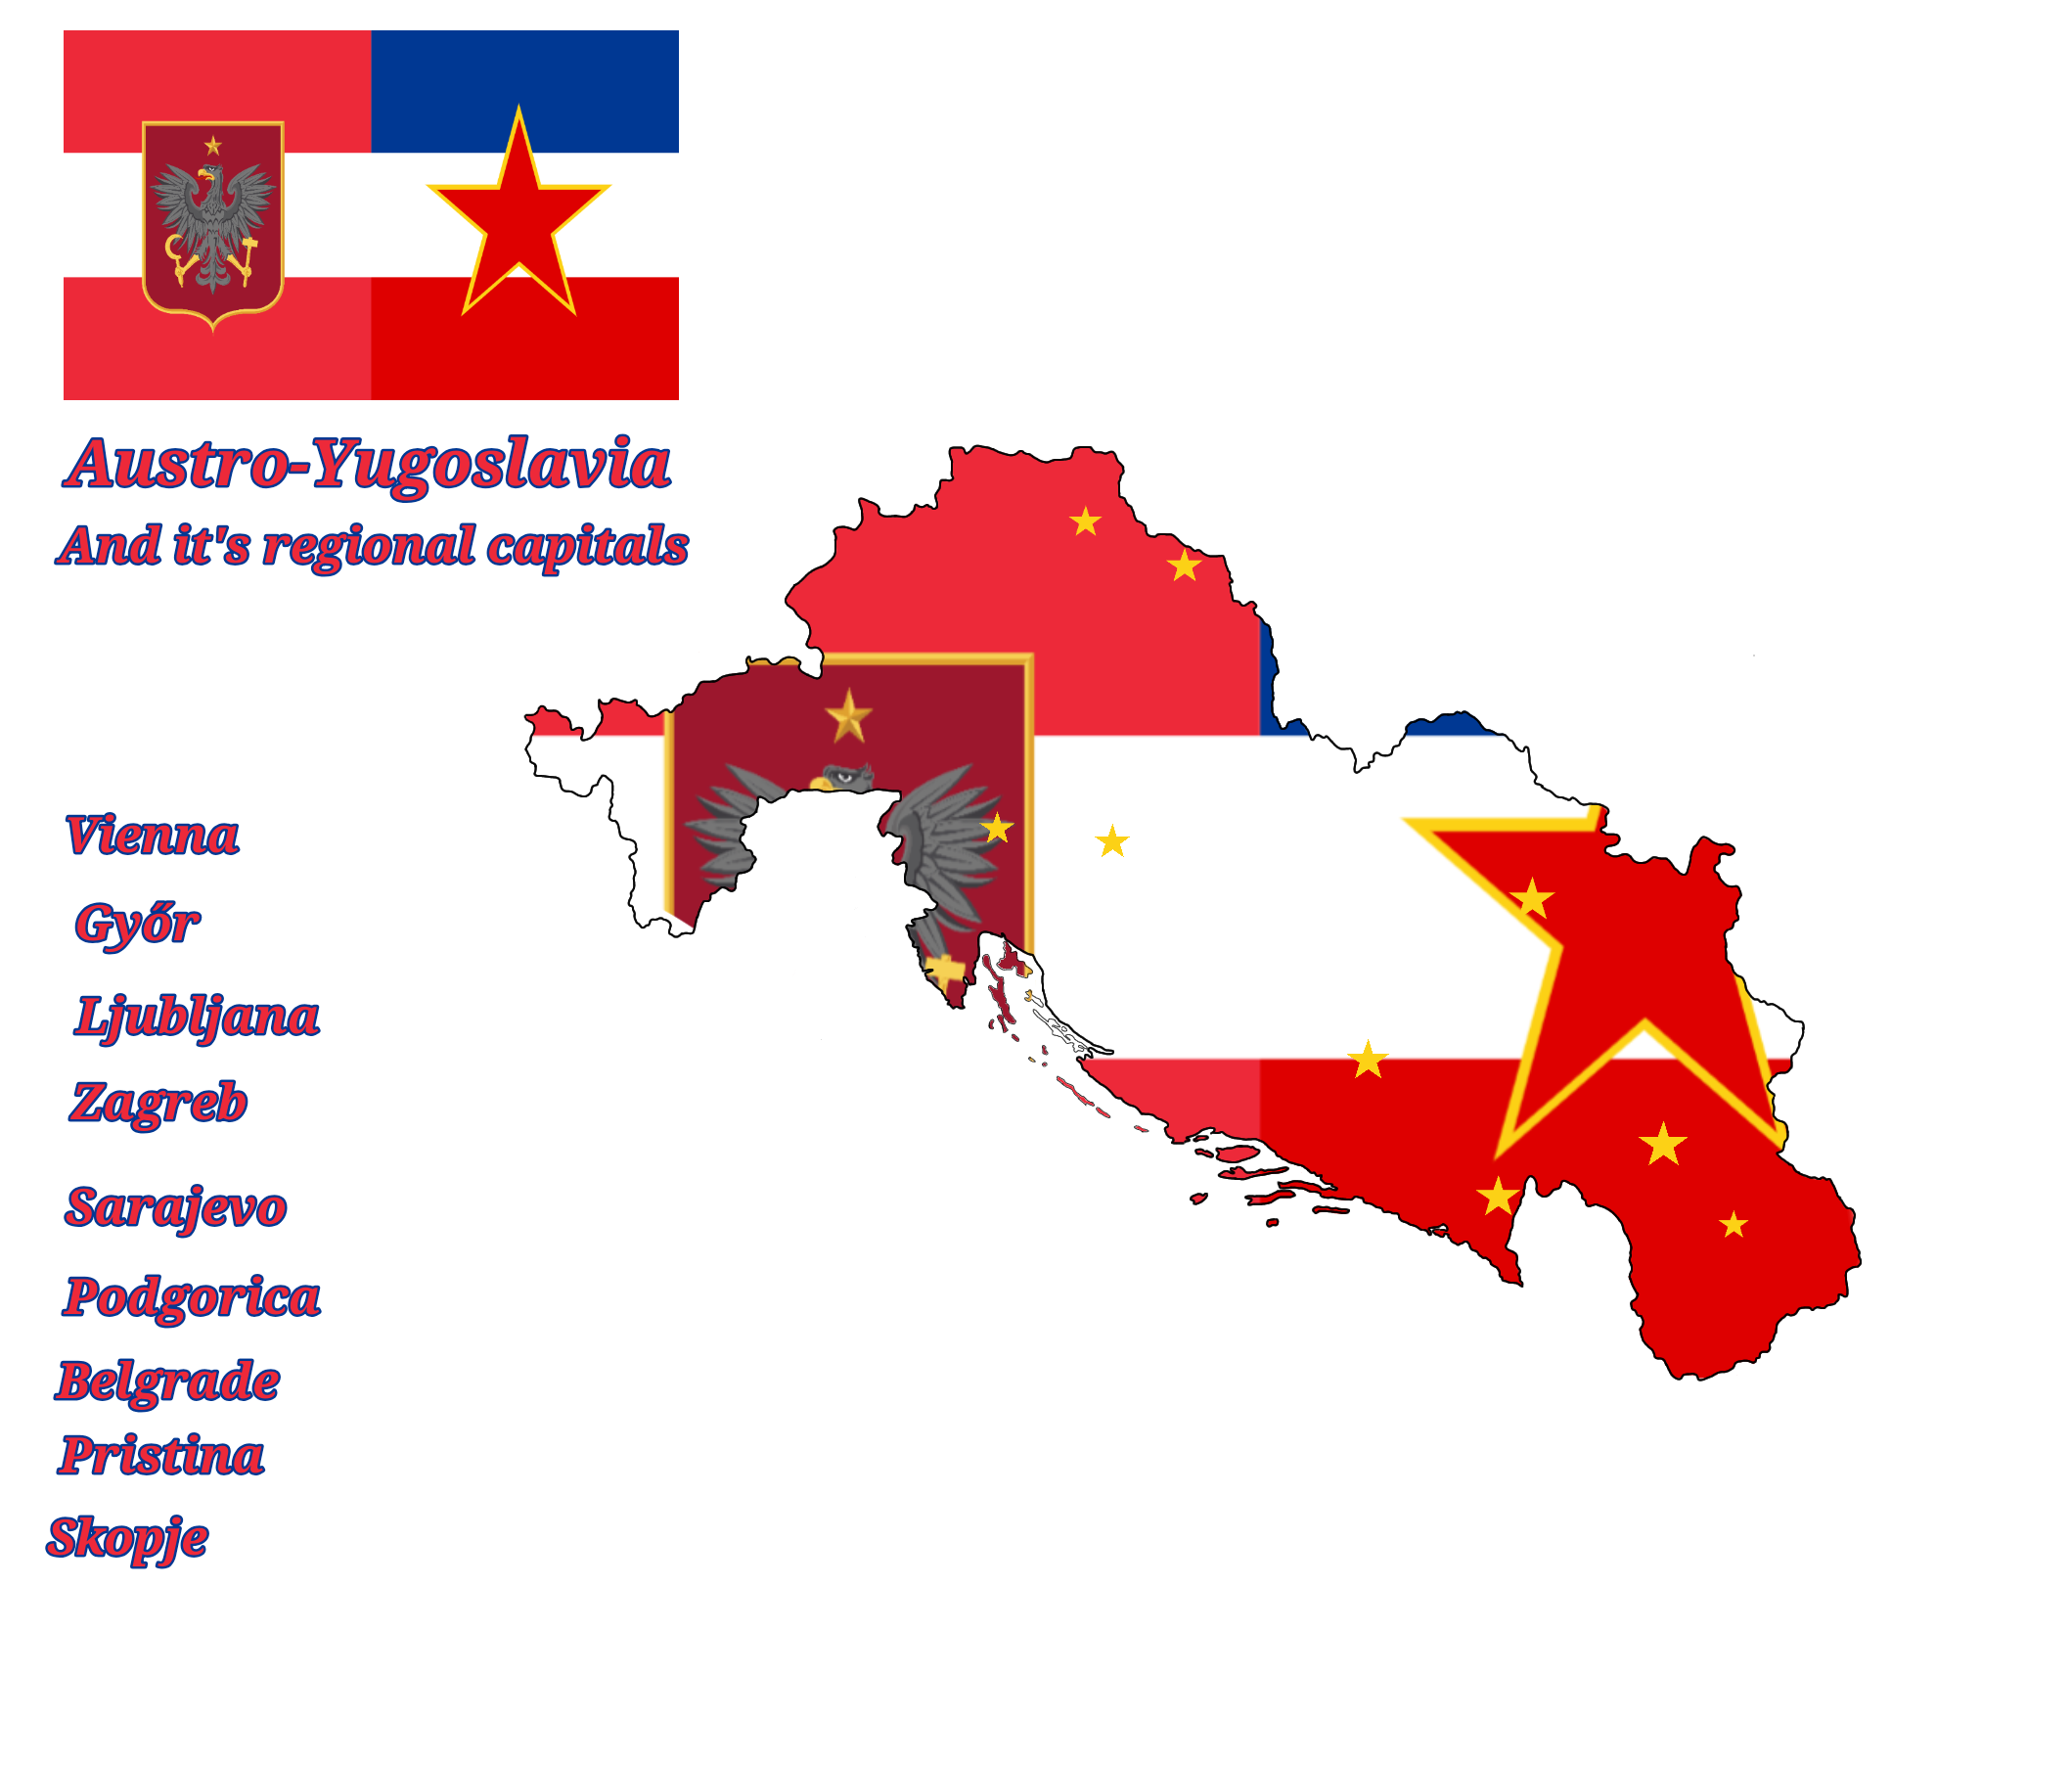 AustroYugo_Map.png